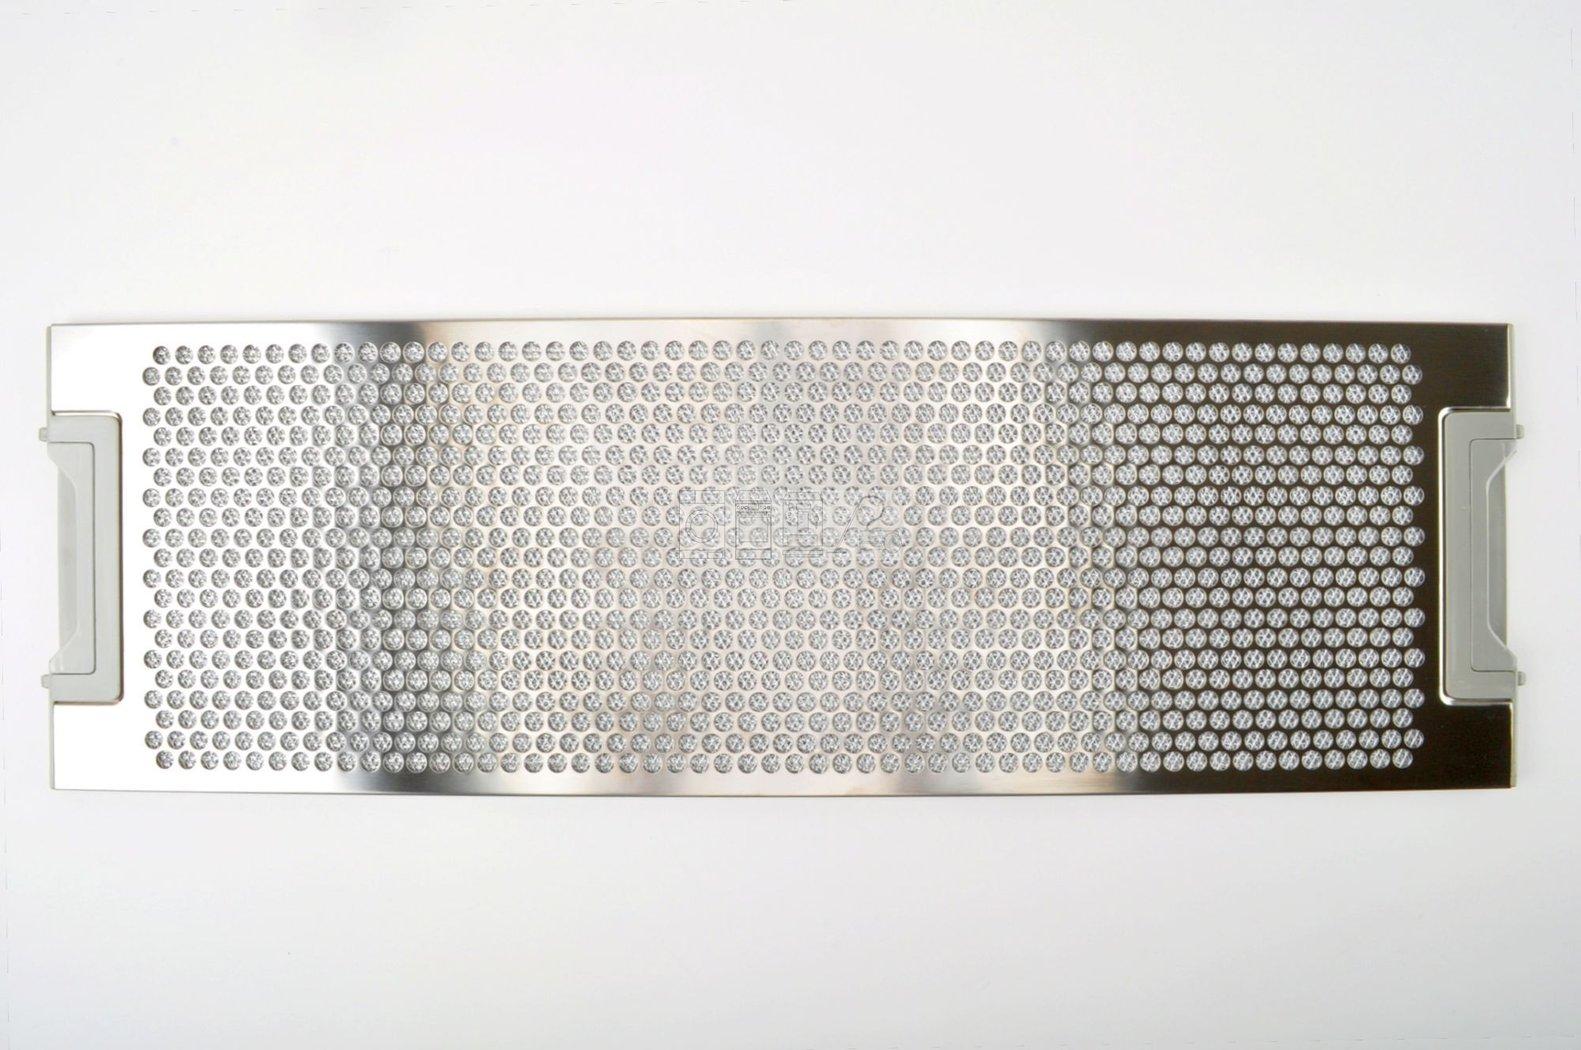 Dunstabzugshaube metallfilter dunstabzugshaube pkm 9860lz